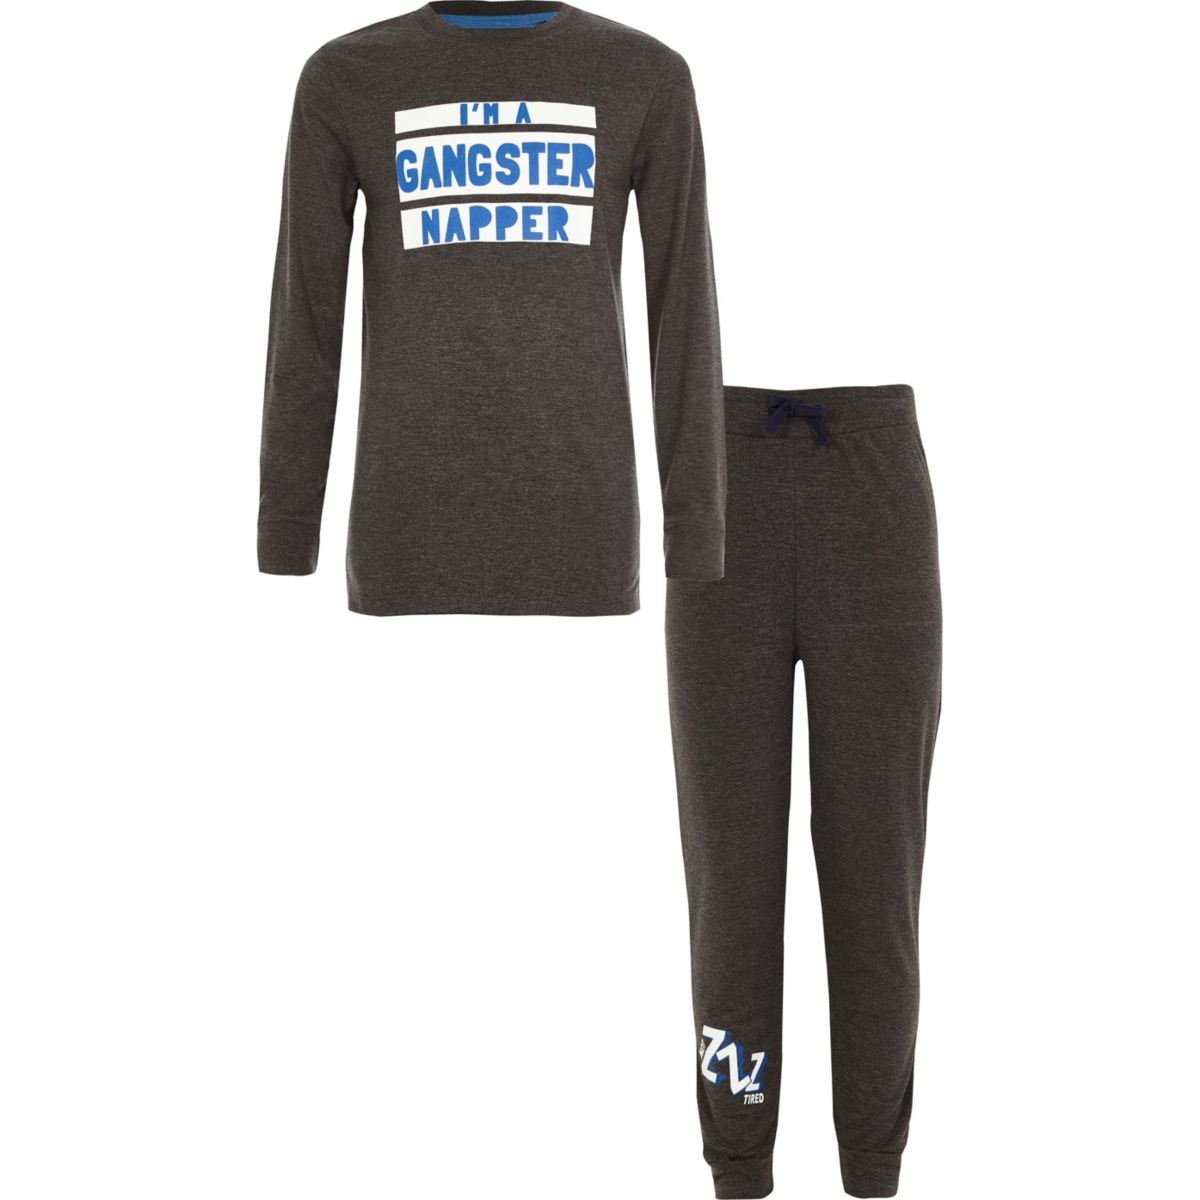 Boys grey 'gangster napper' print pyjama set